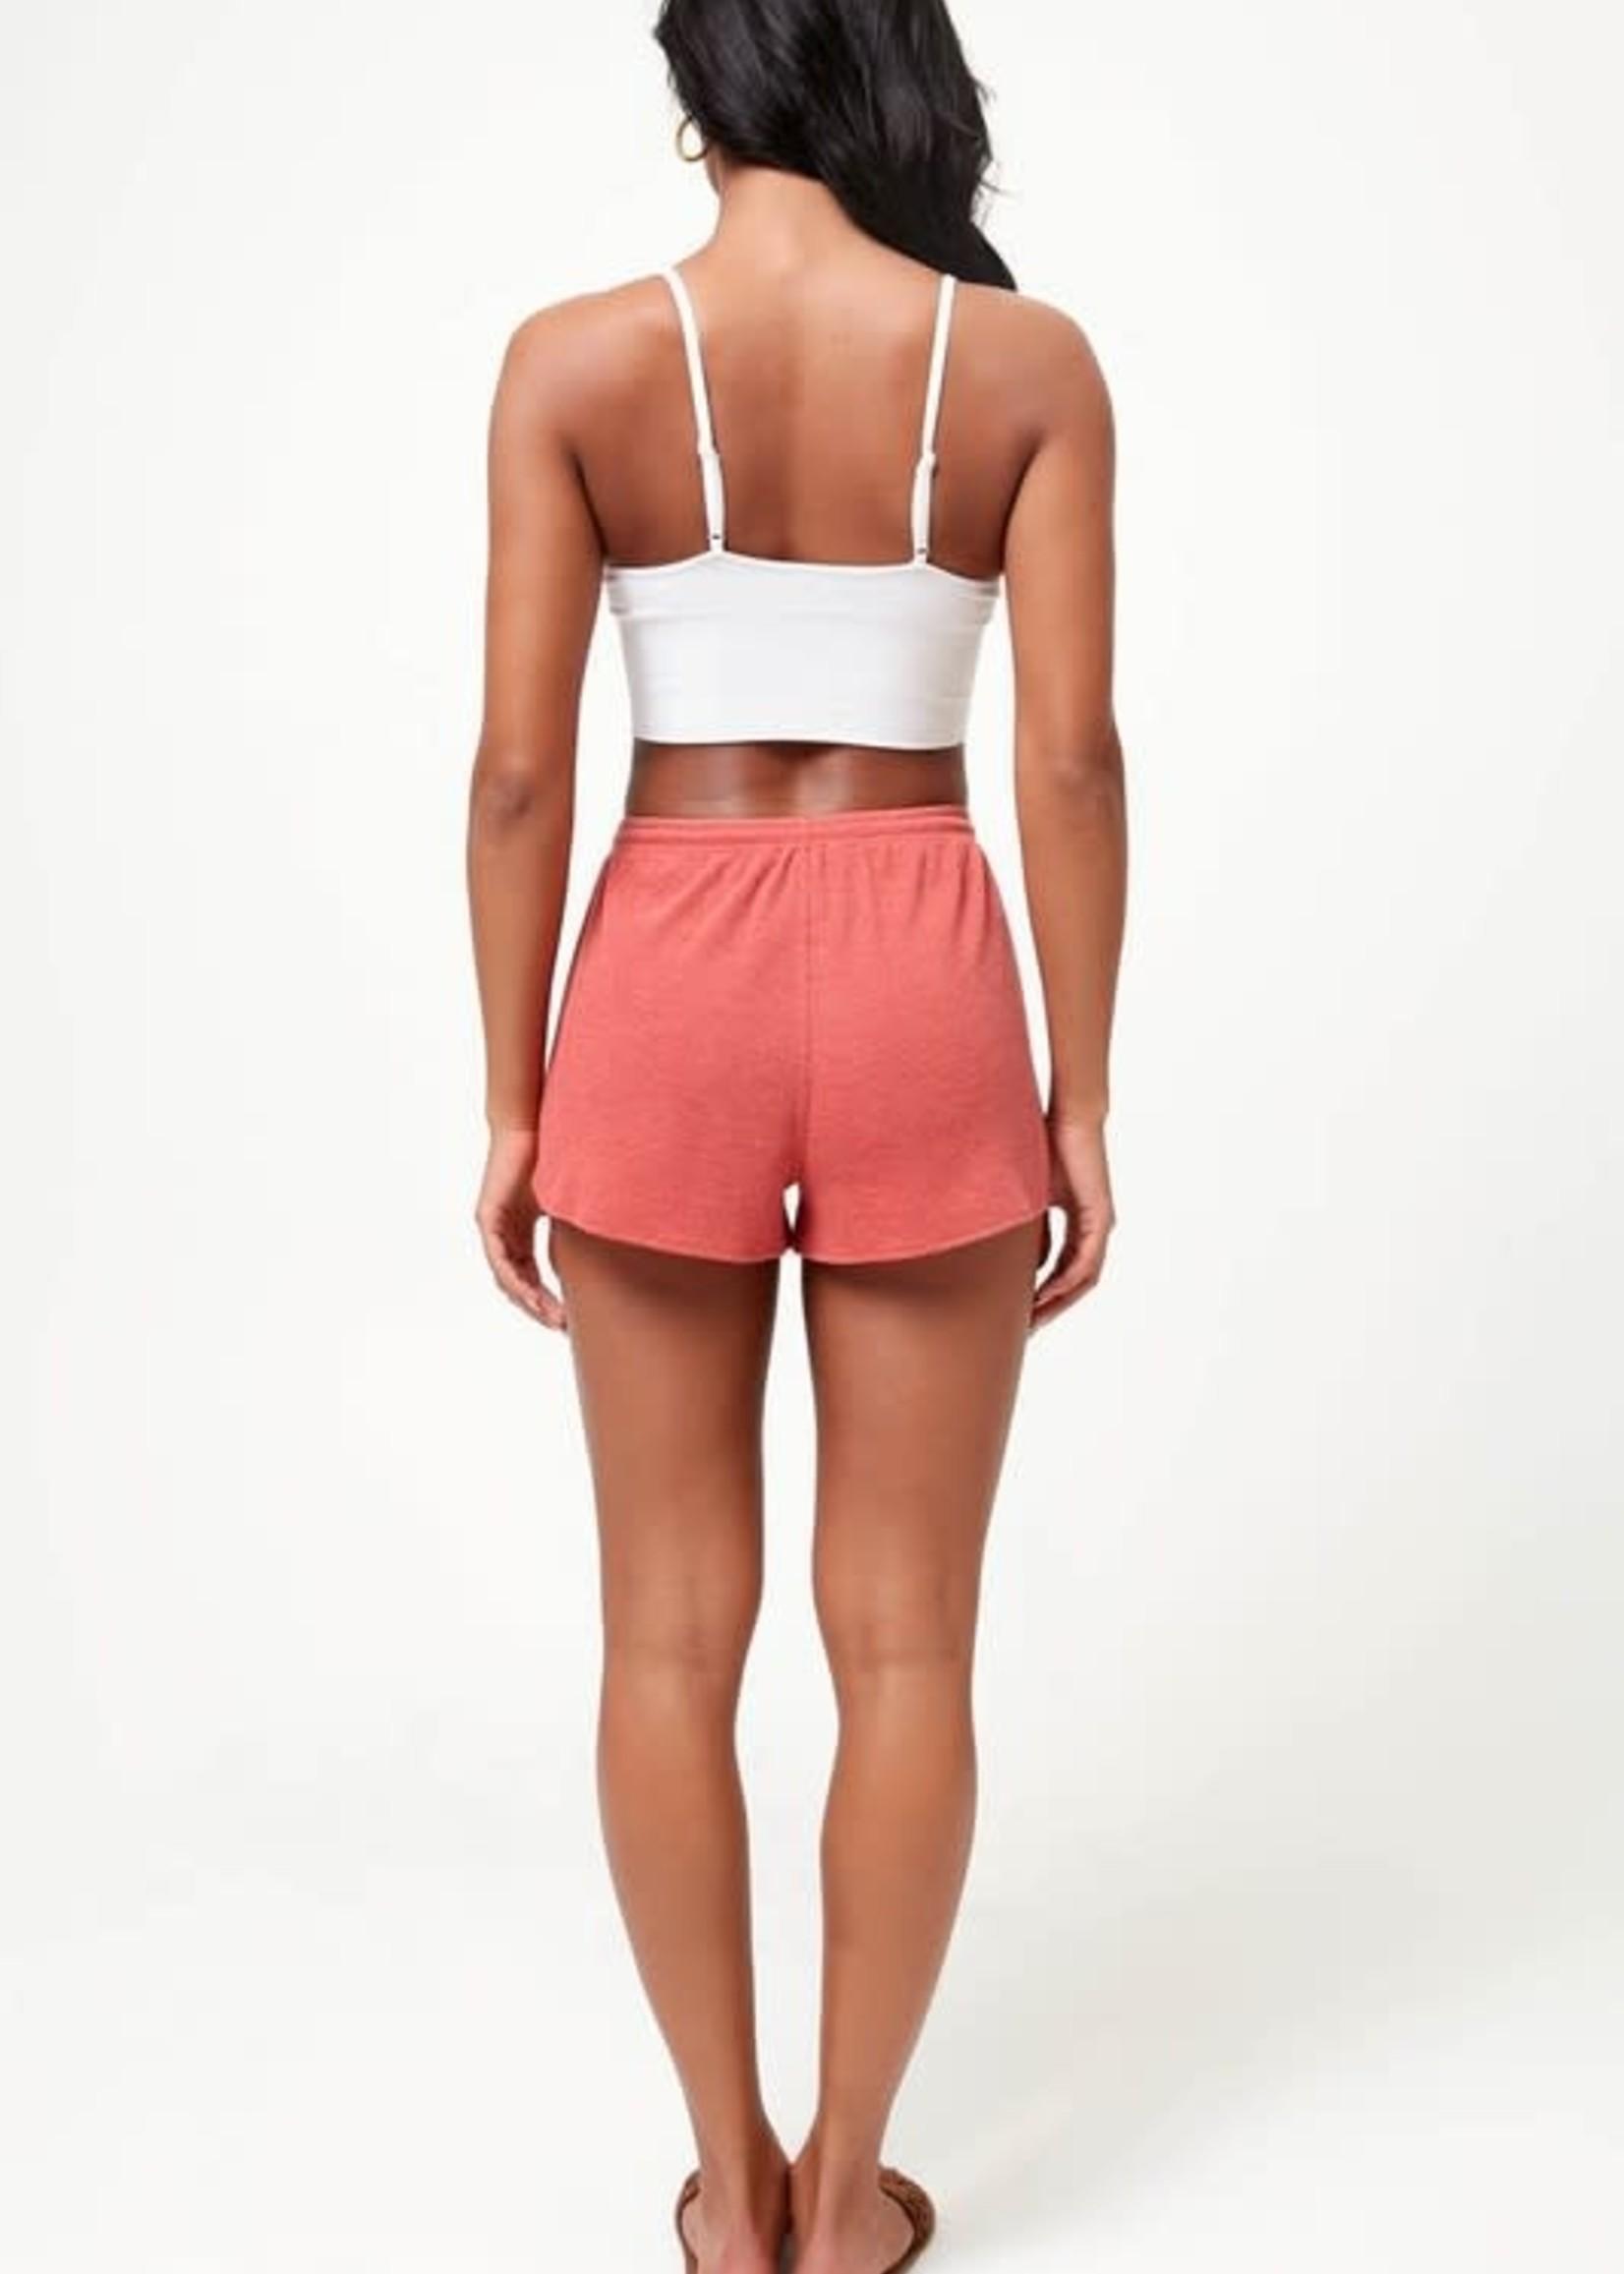 EM & ELLE All the Time Knit Shorts